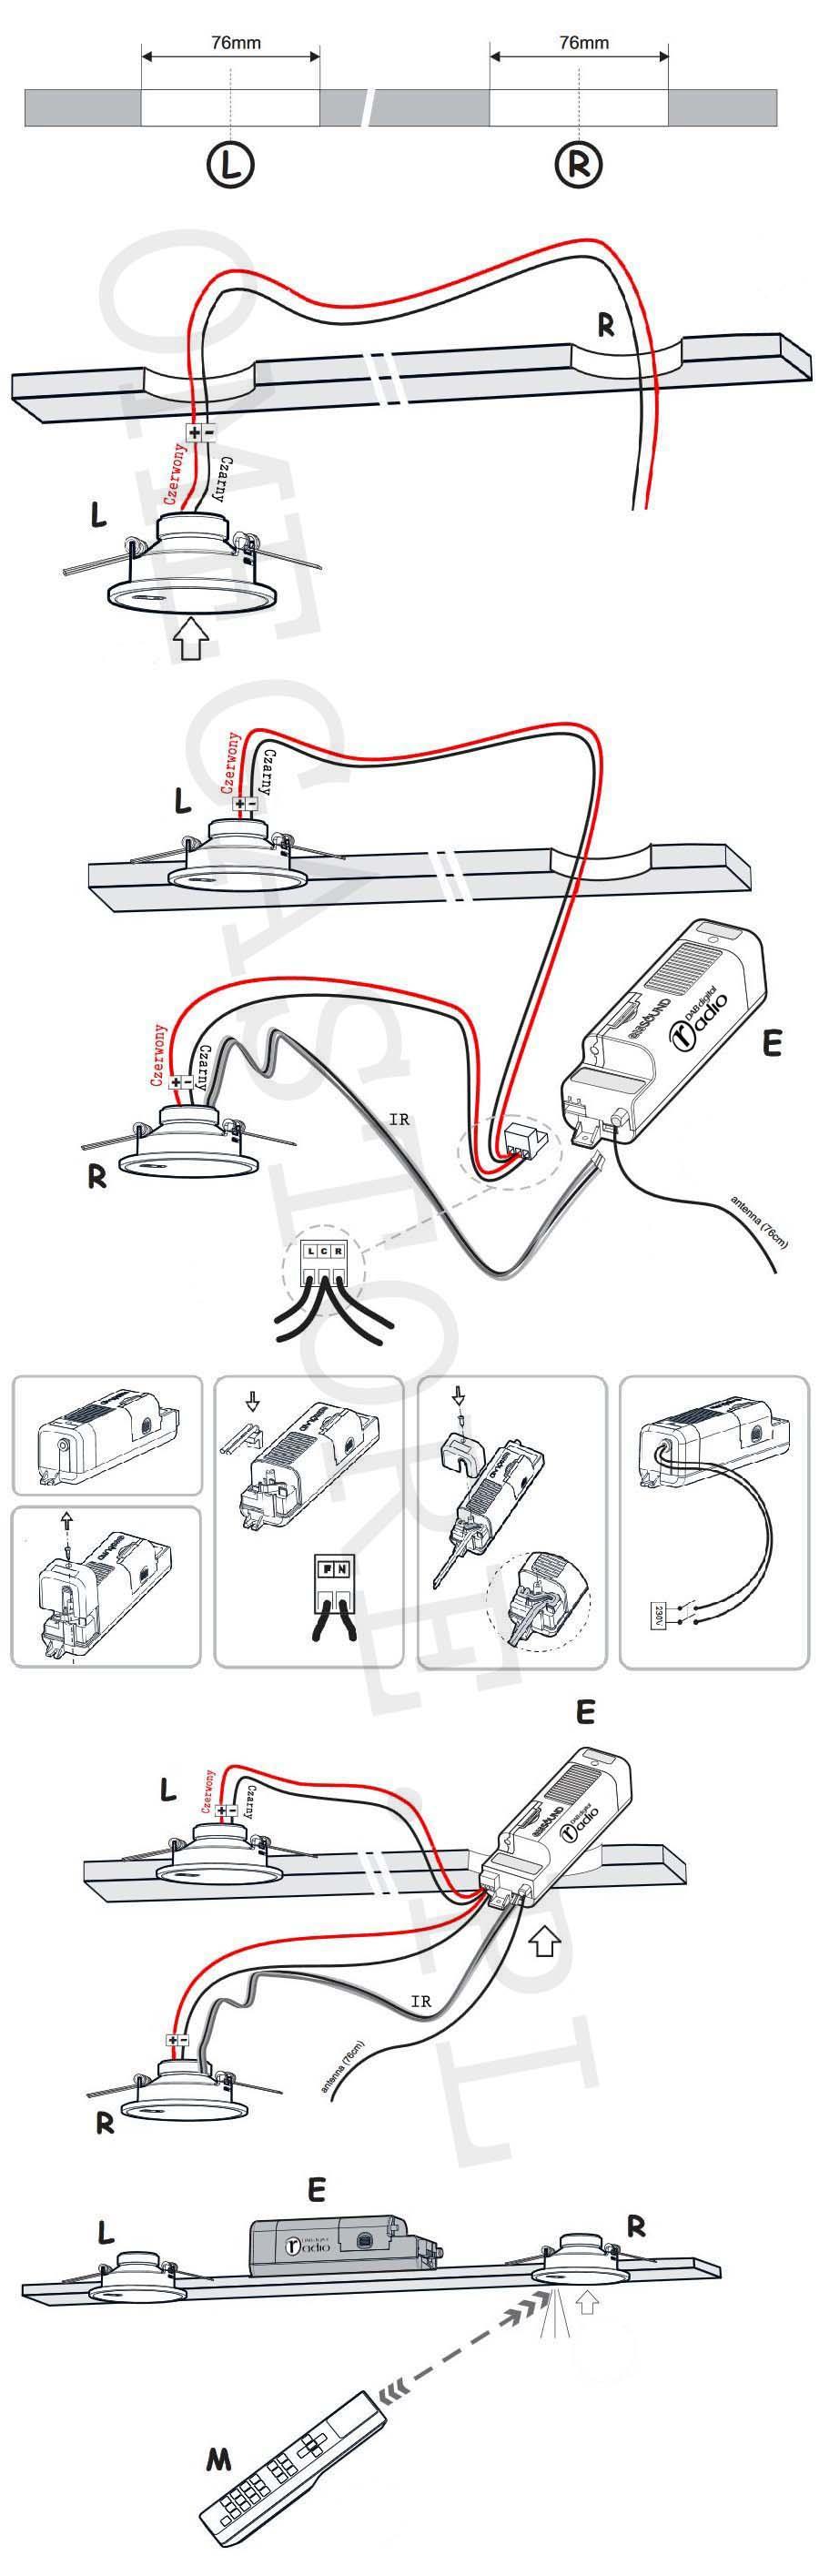 KBSOUND - instrukcja